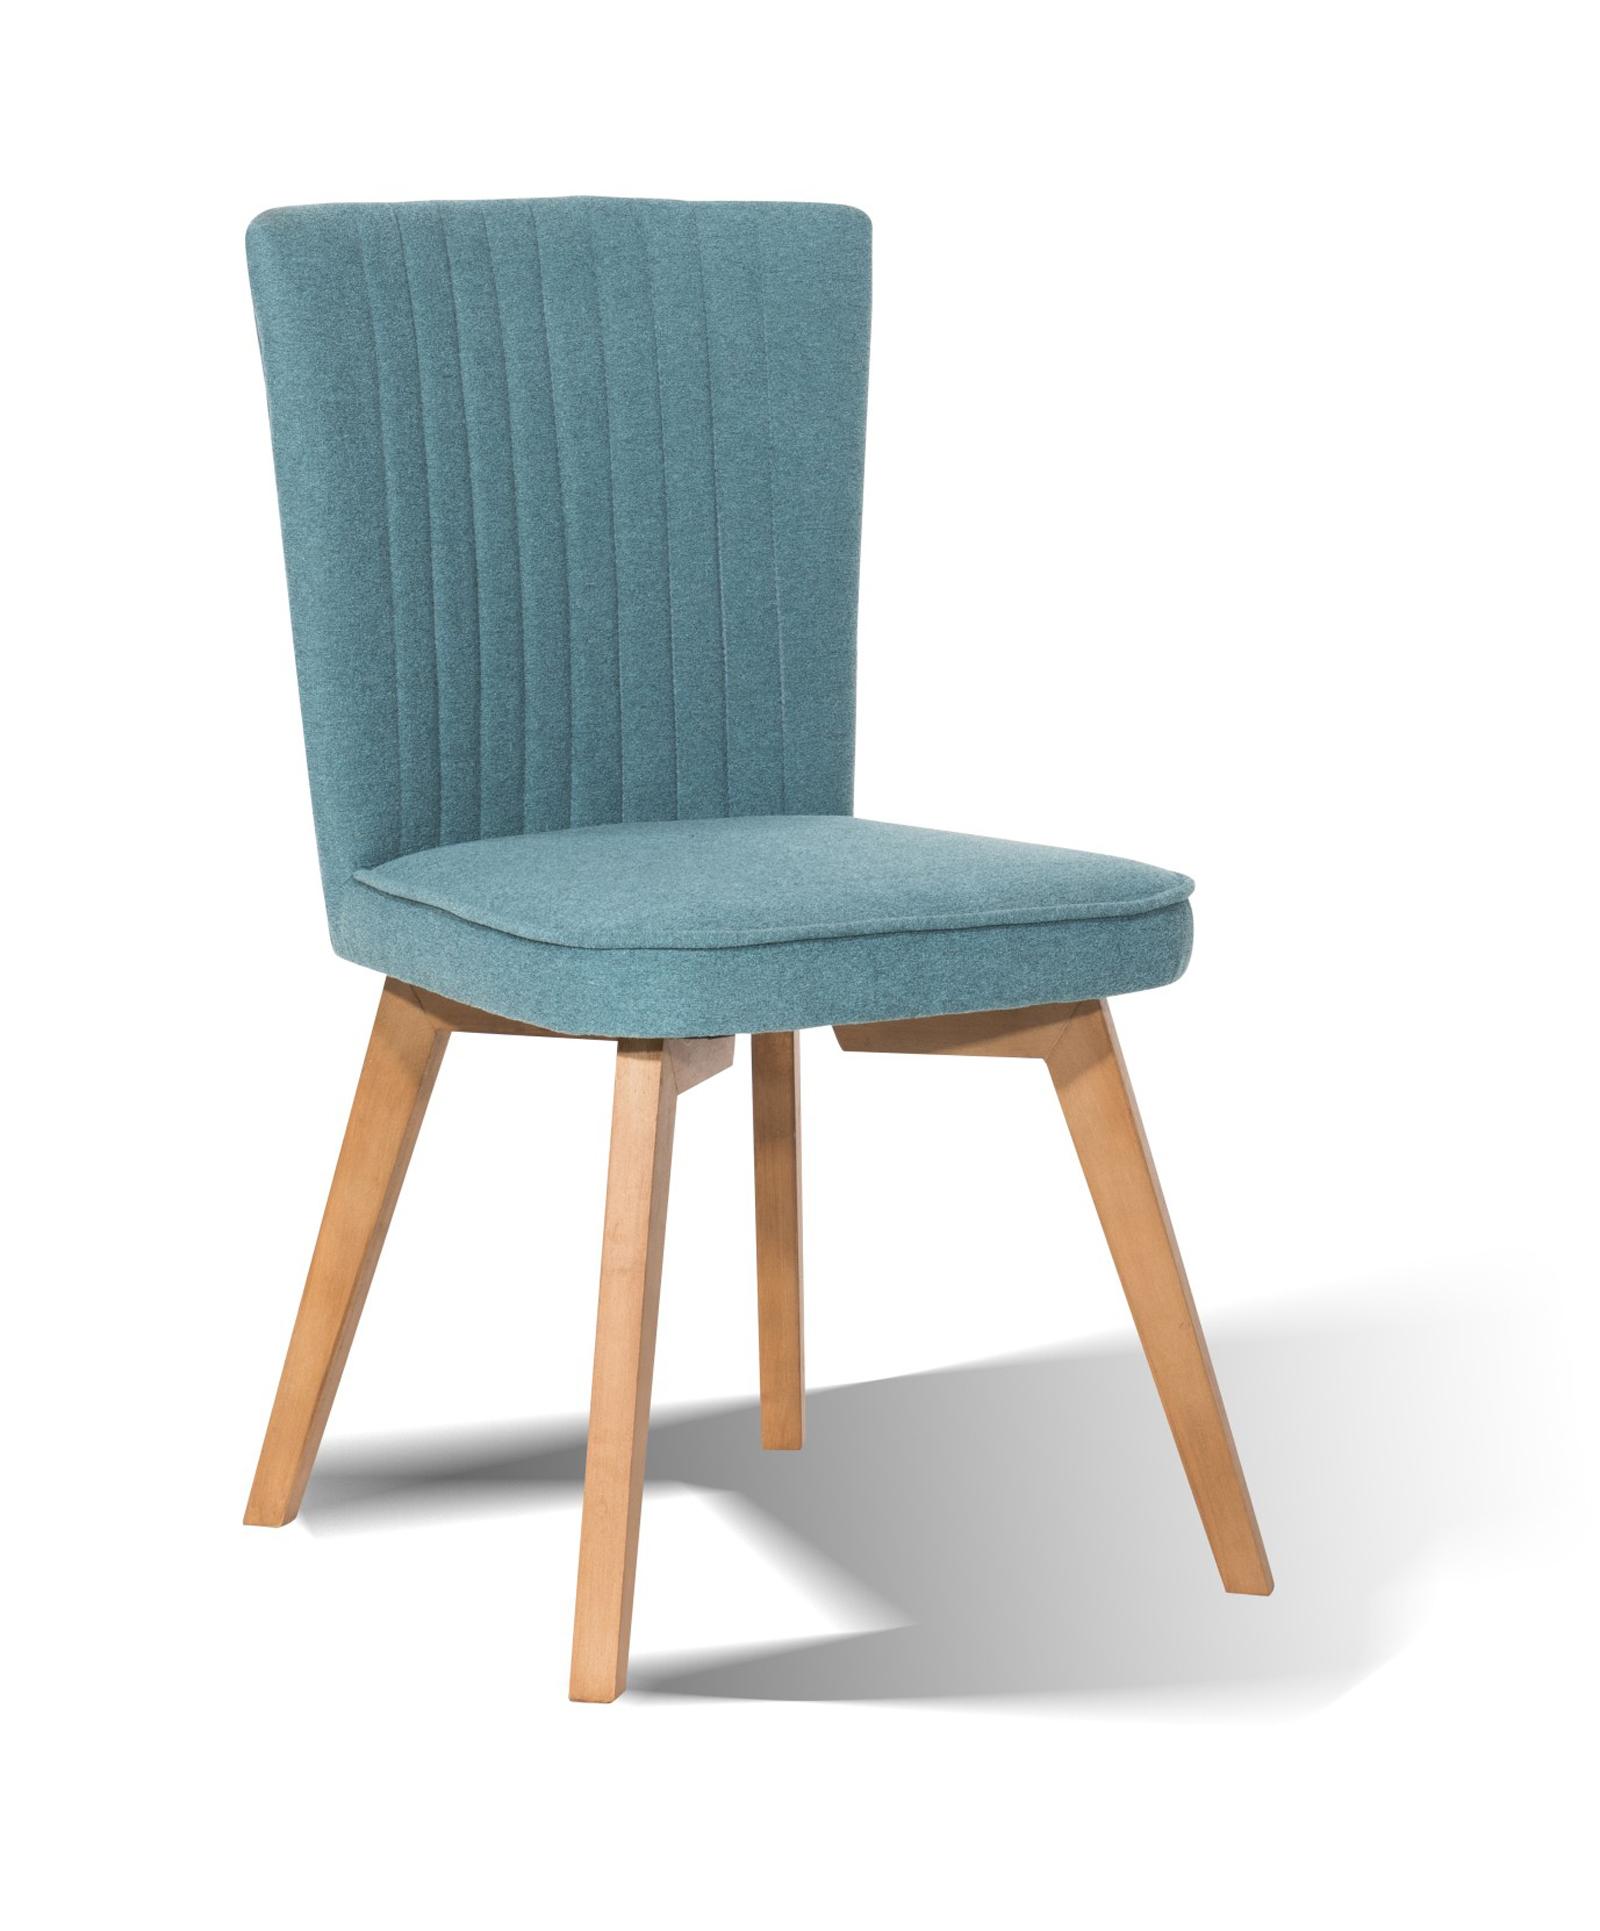 Aqua blau esszimmer st hle m belideen for Stuhl nordisches design